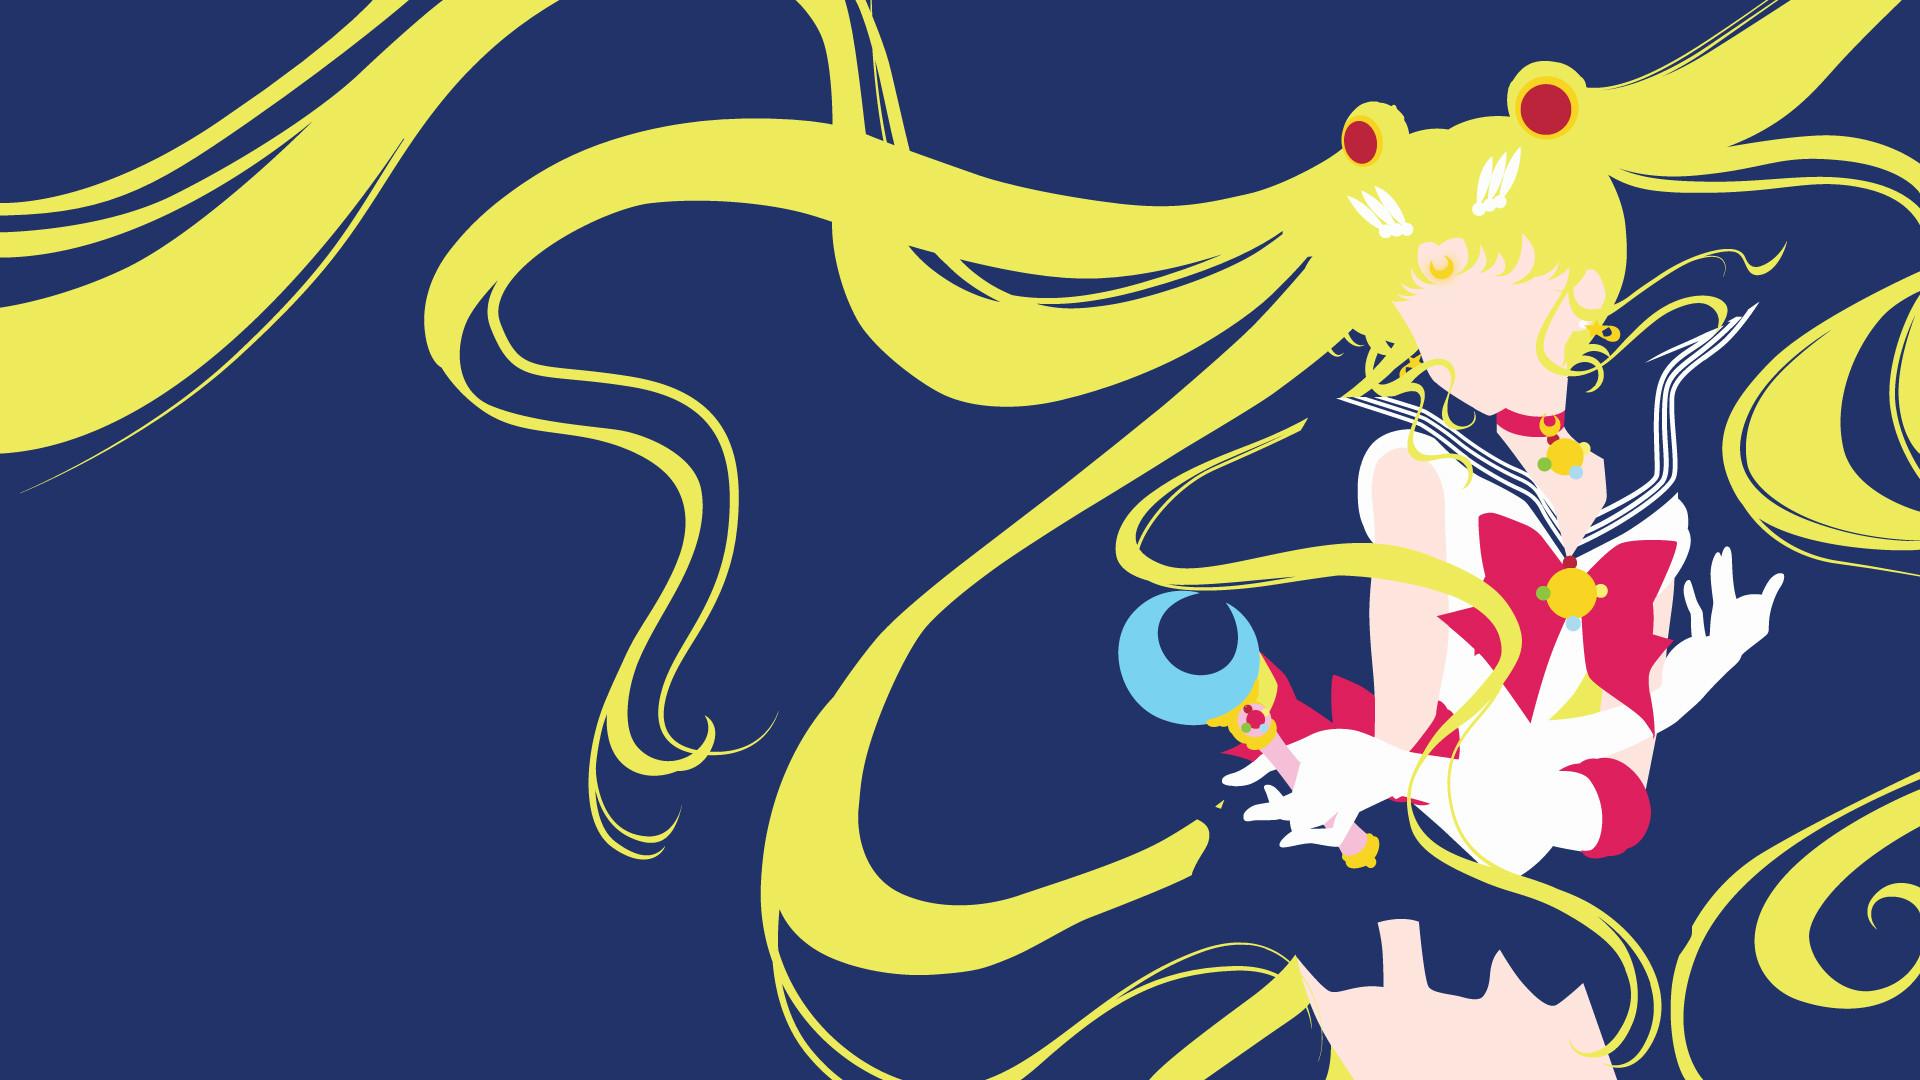 sailor_moon_from_sailor_moon_crystal___minimalist_by_matsumayu-d8vt95s .